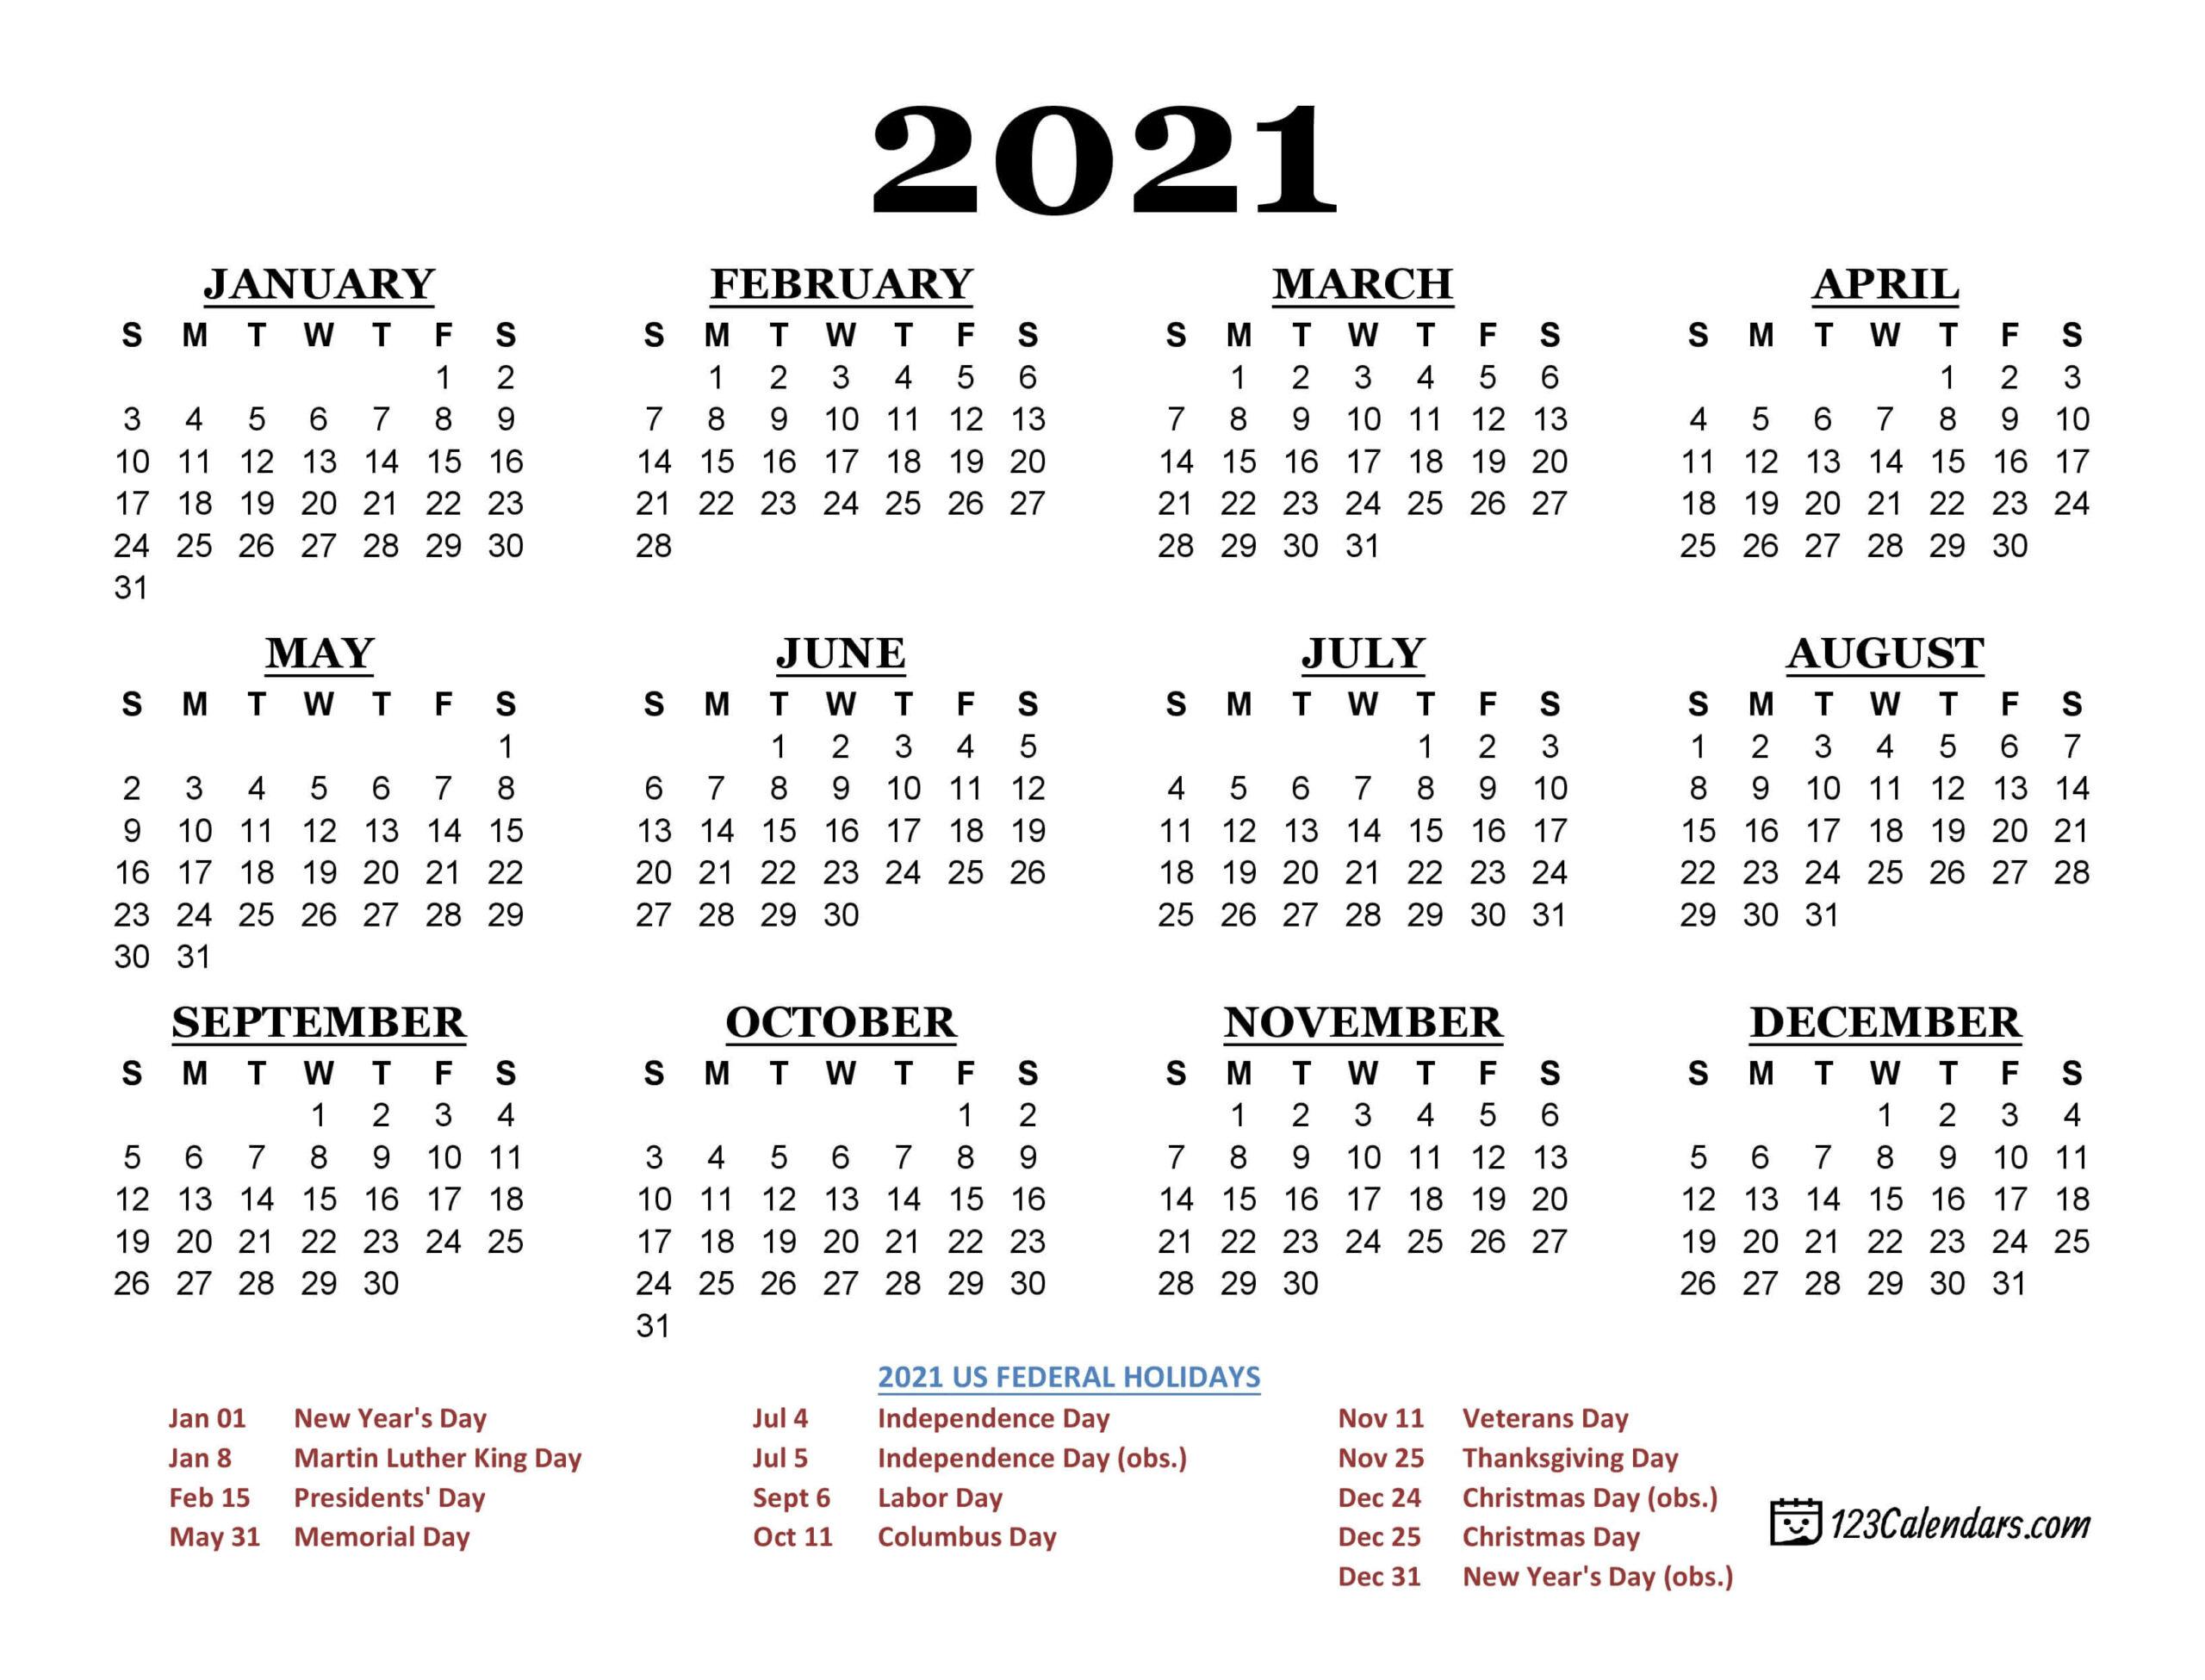 2021 Printable Calendar | 123Calendars intended for Calendar November December January Space To Write At The Side